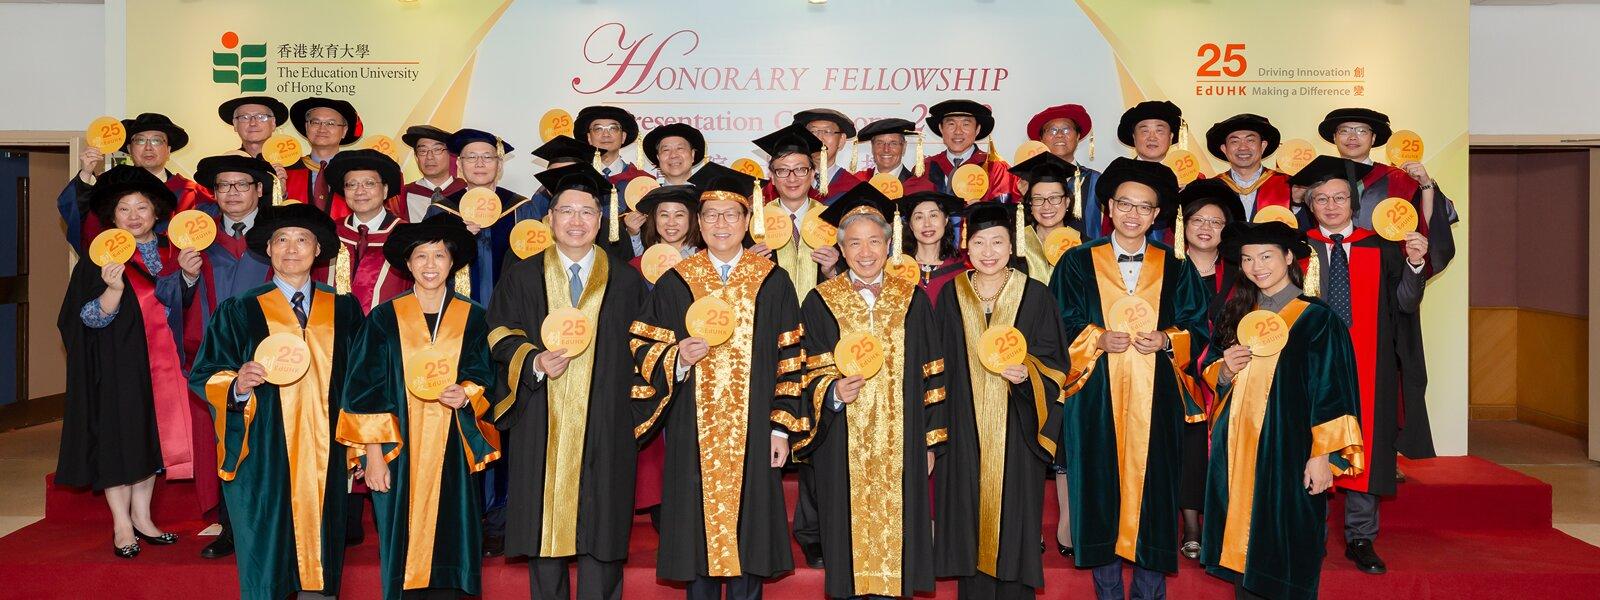 The 11th Honorary Fellowship Presentation Ceremony